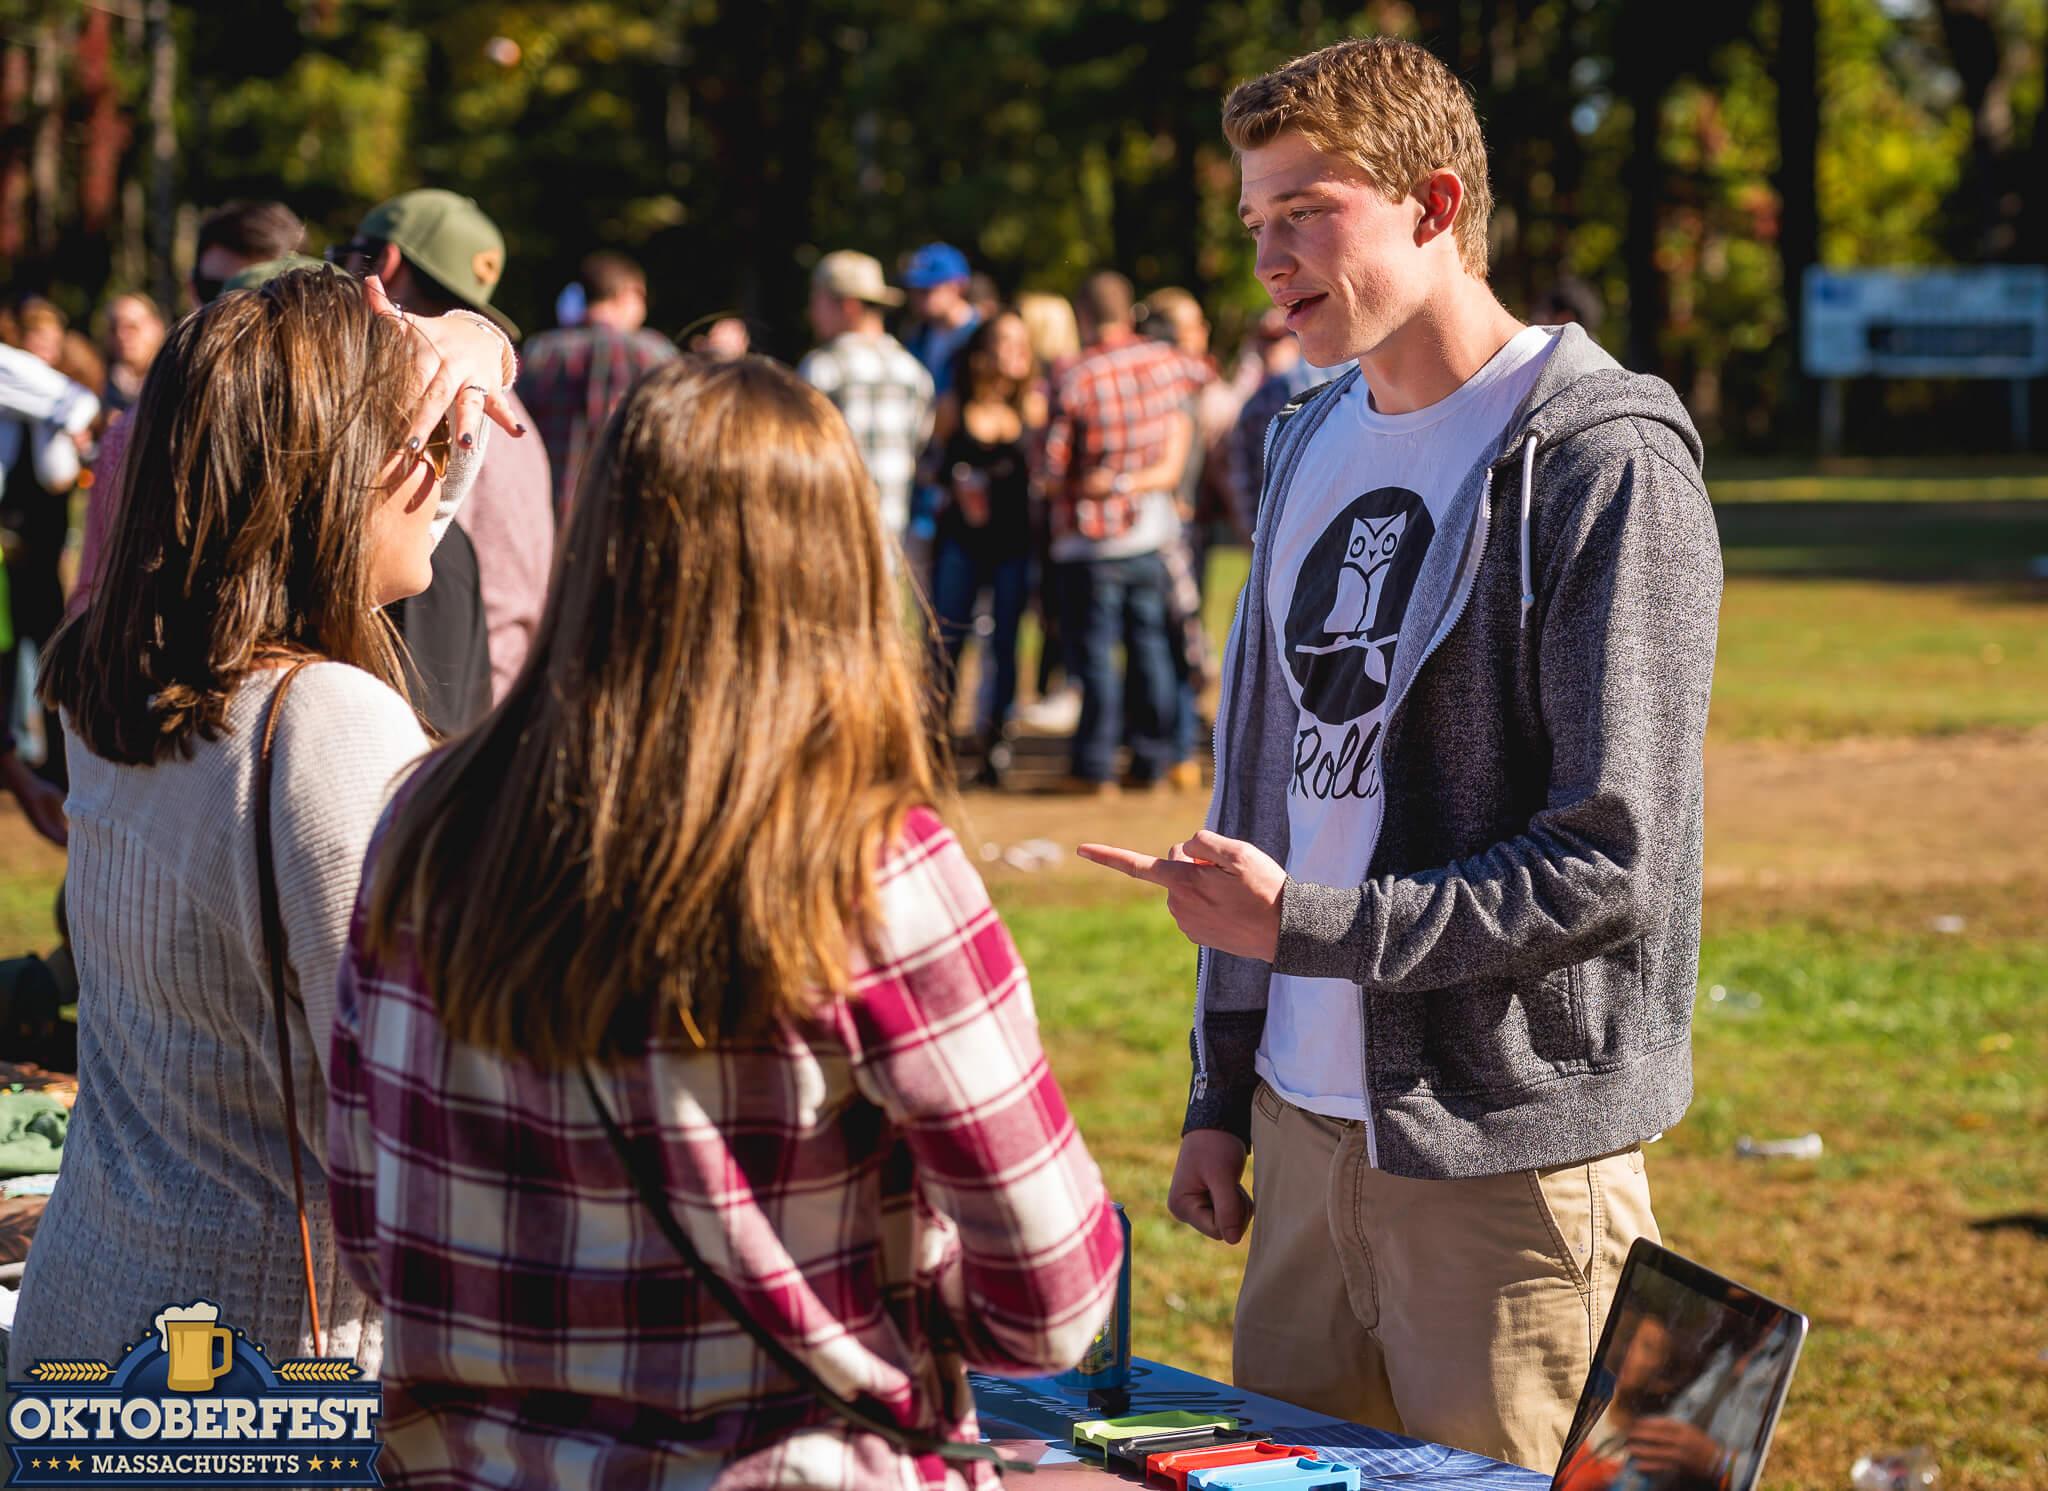 Oktoberfest Massachusetts Info